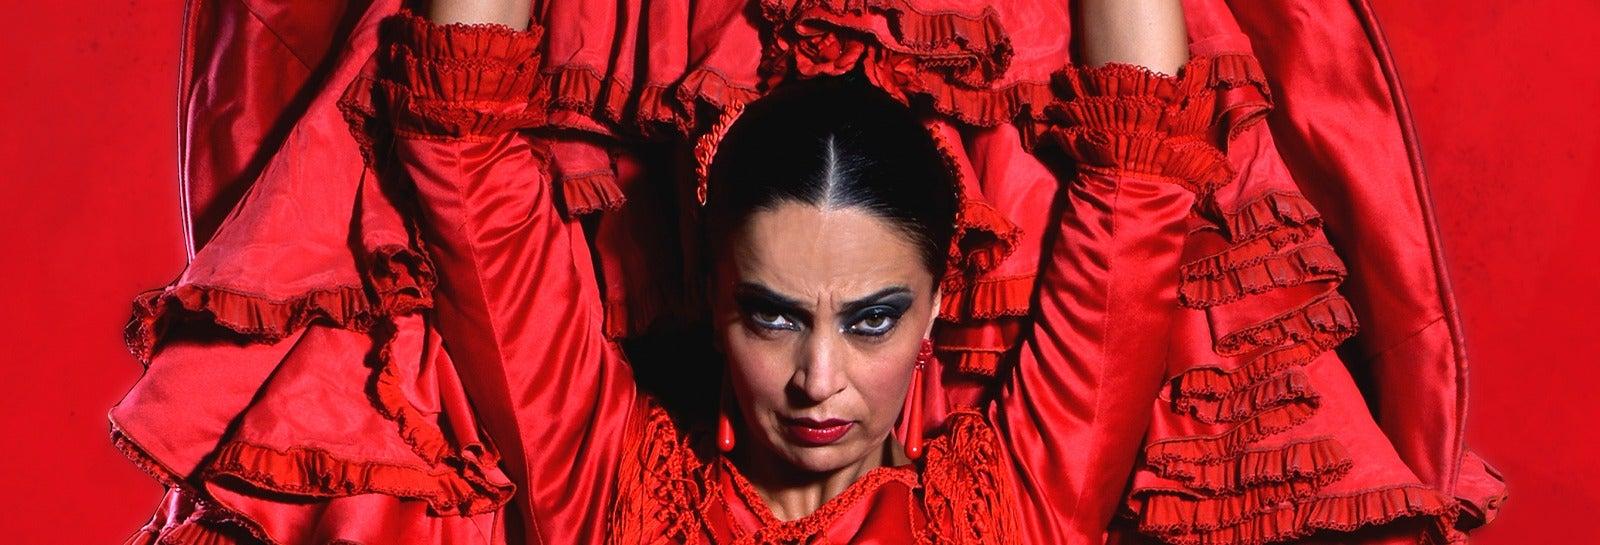 Espetáculo no Teatro Flamenco